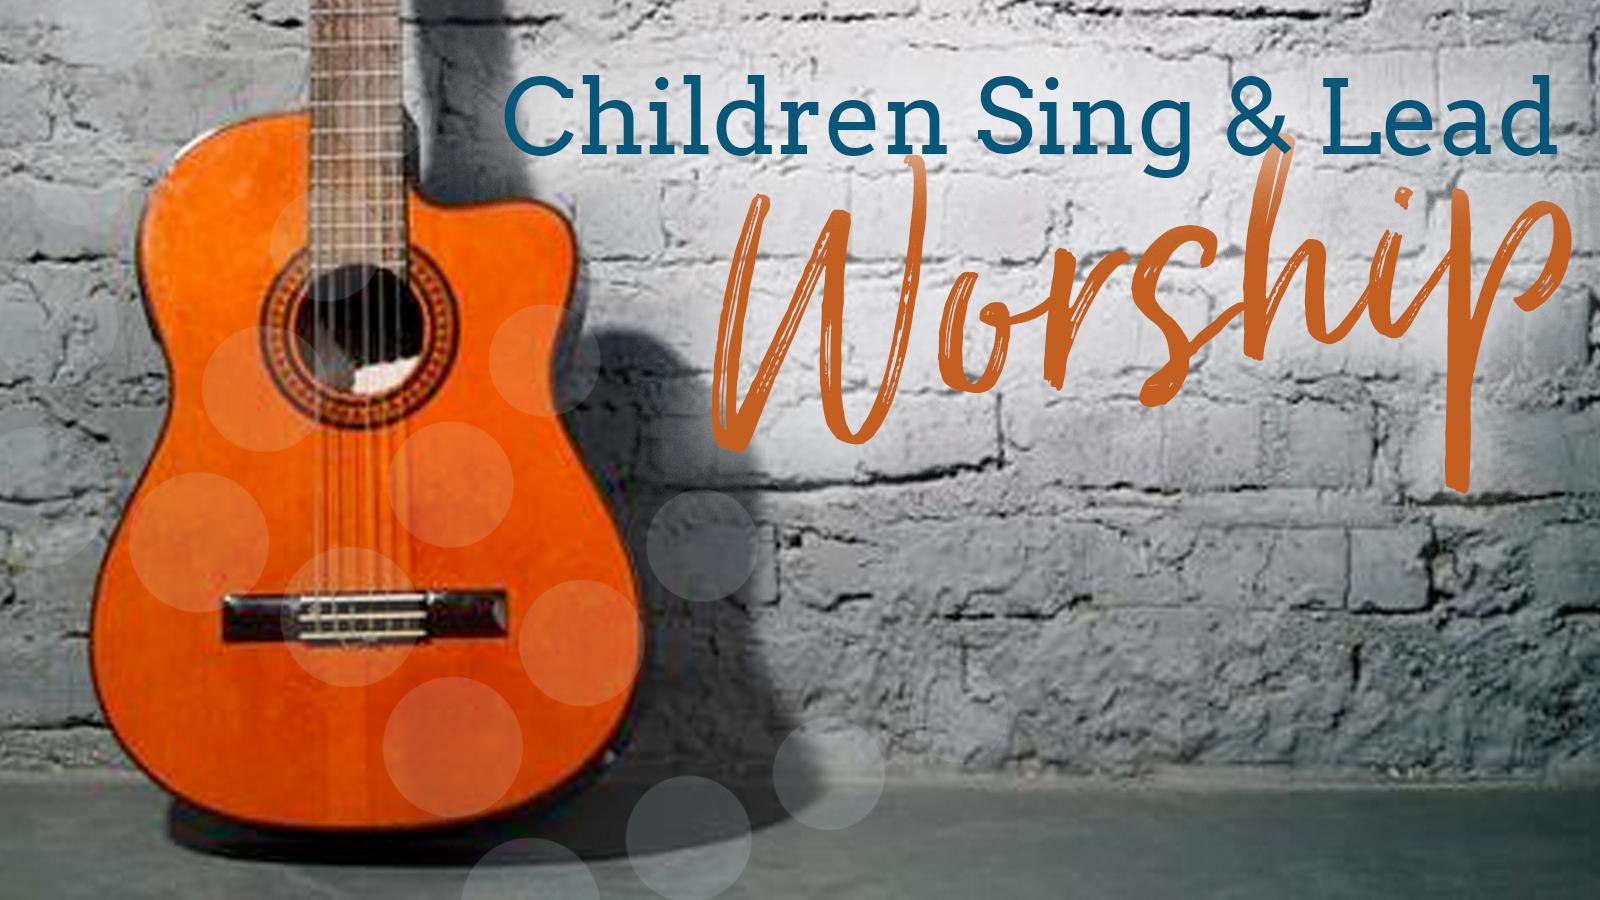 Childrenworship